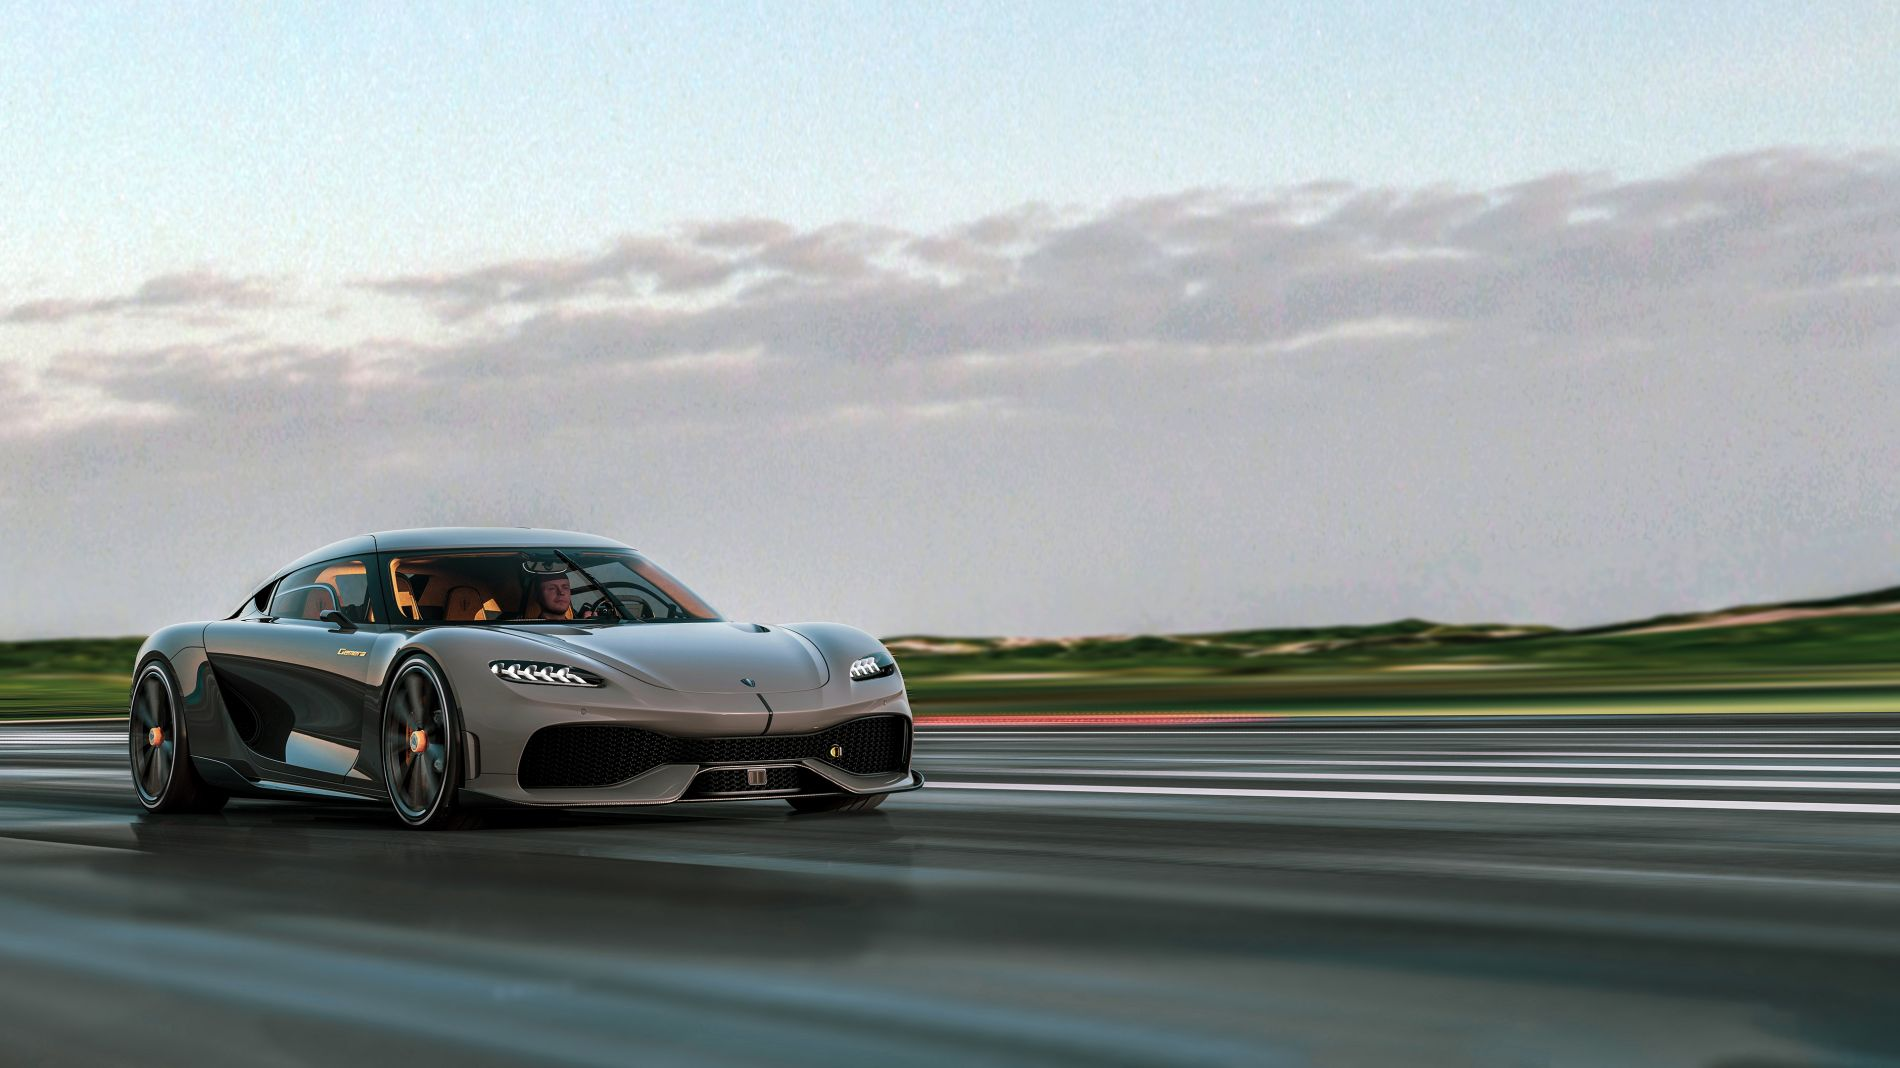 Koenigsegg Gemera - მდიდრების საოჯახო მანქანა